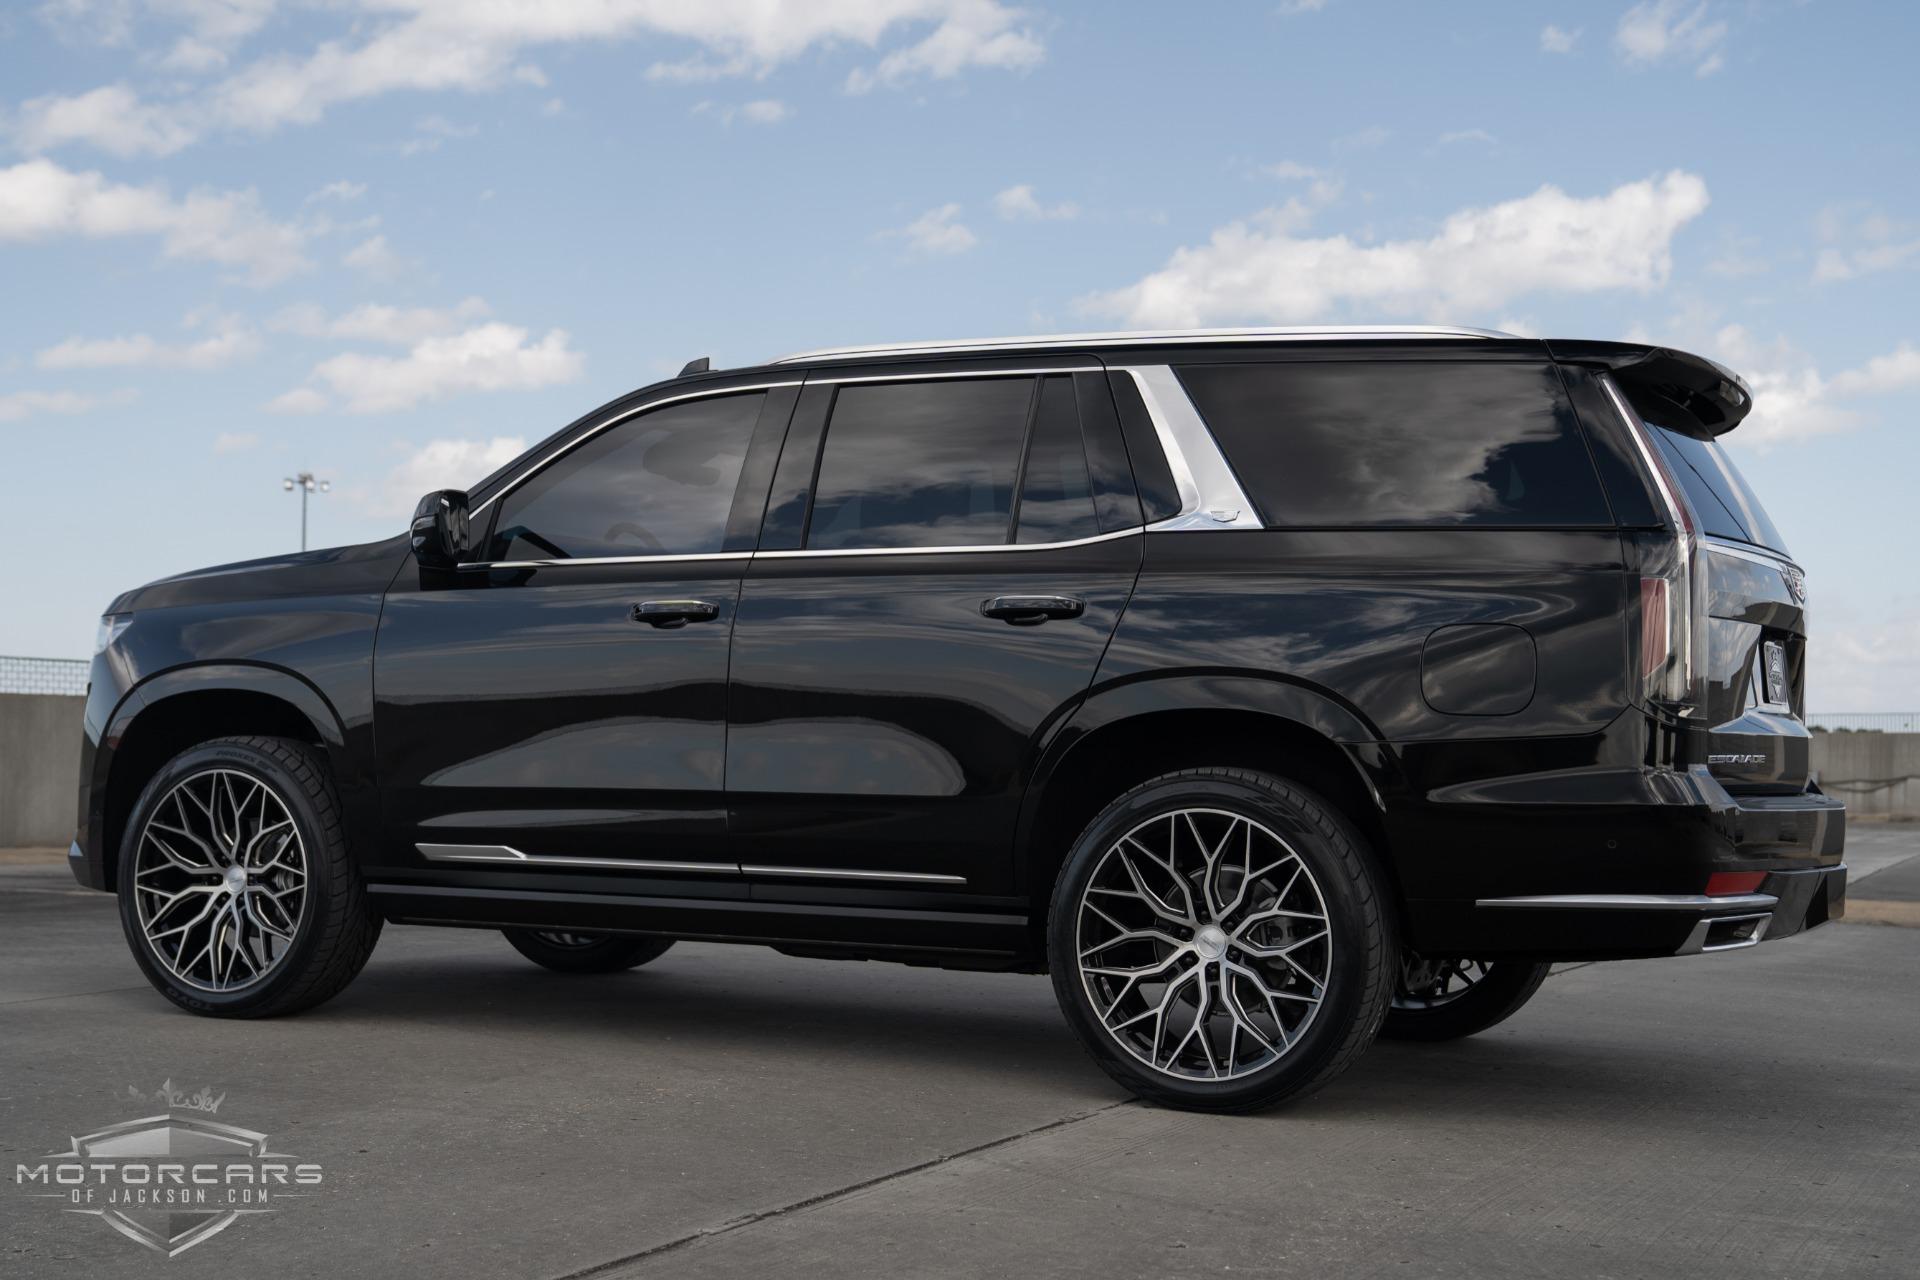 Used-2021-Cadillac-Escalade-Premium-Luxury-4WD-for-sale-Jackson-MS